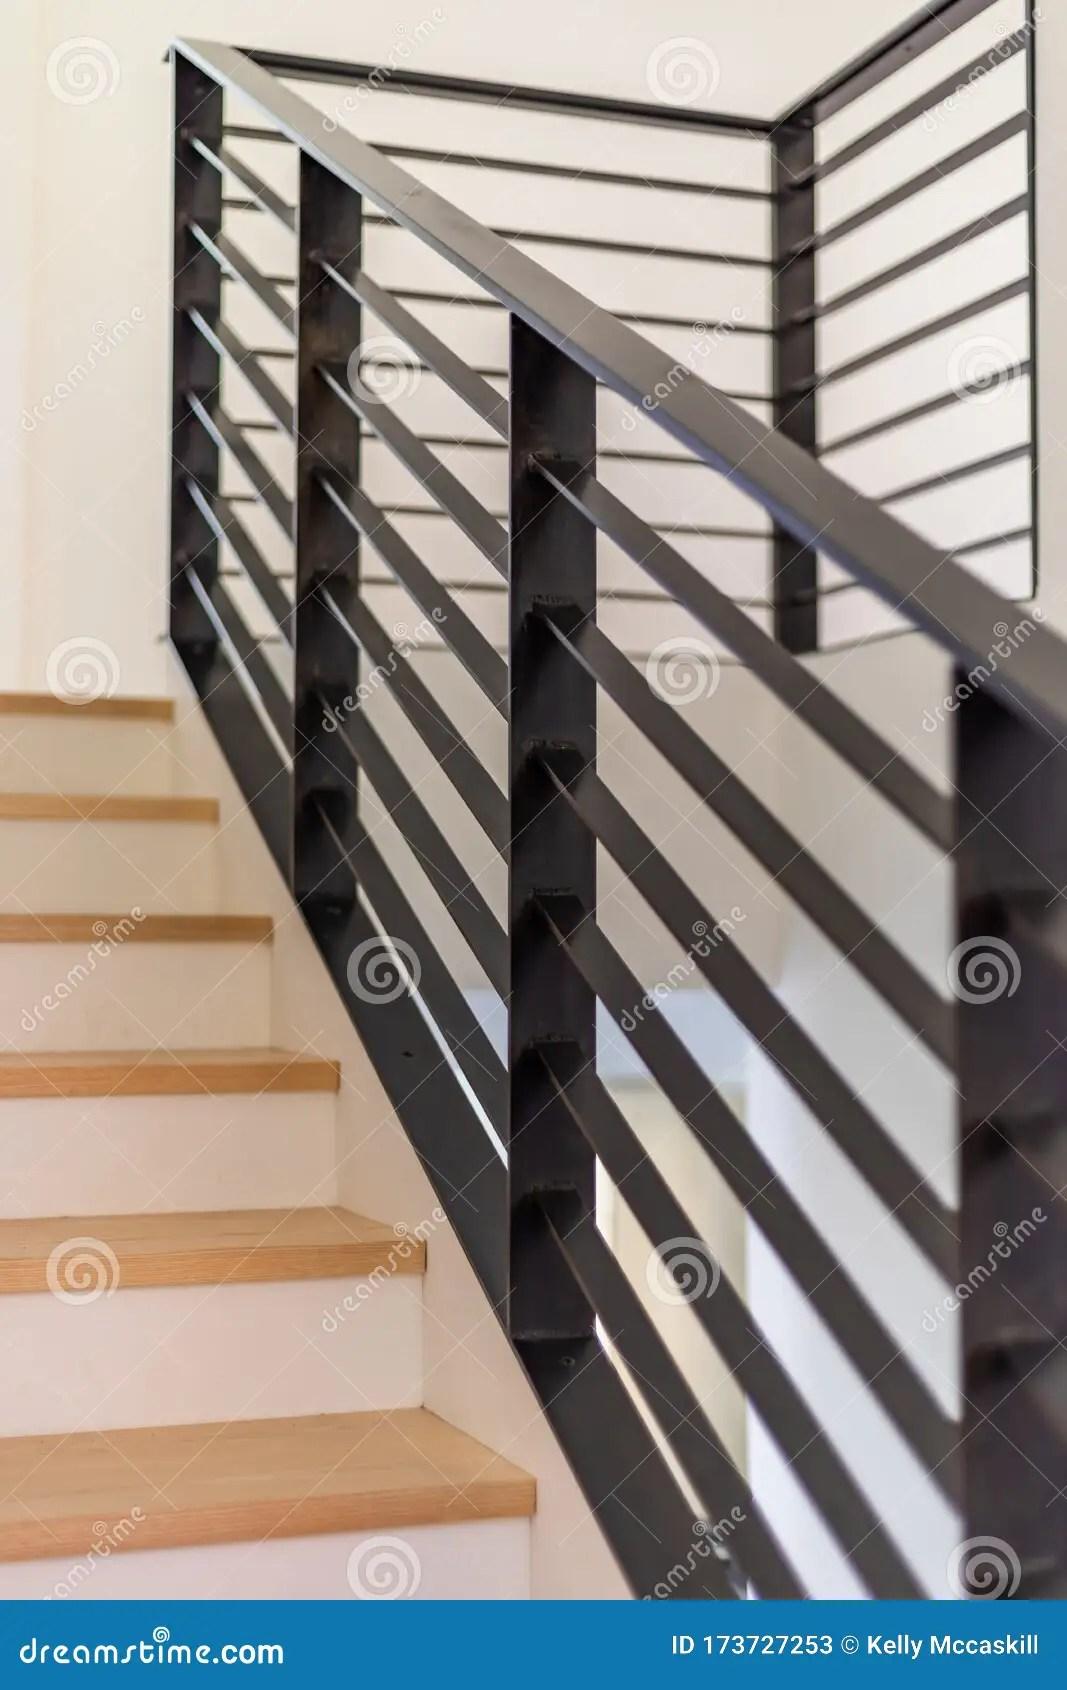 Custom Black Metal Stair Railing Stock Image Image Of Detail | Black Steel Stair Railing | Custom | Wood | Residential Indoor Residential Glass | Stainless Steel | Concrete